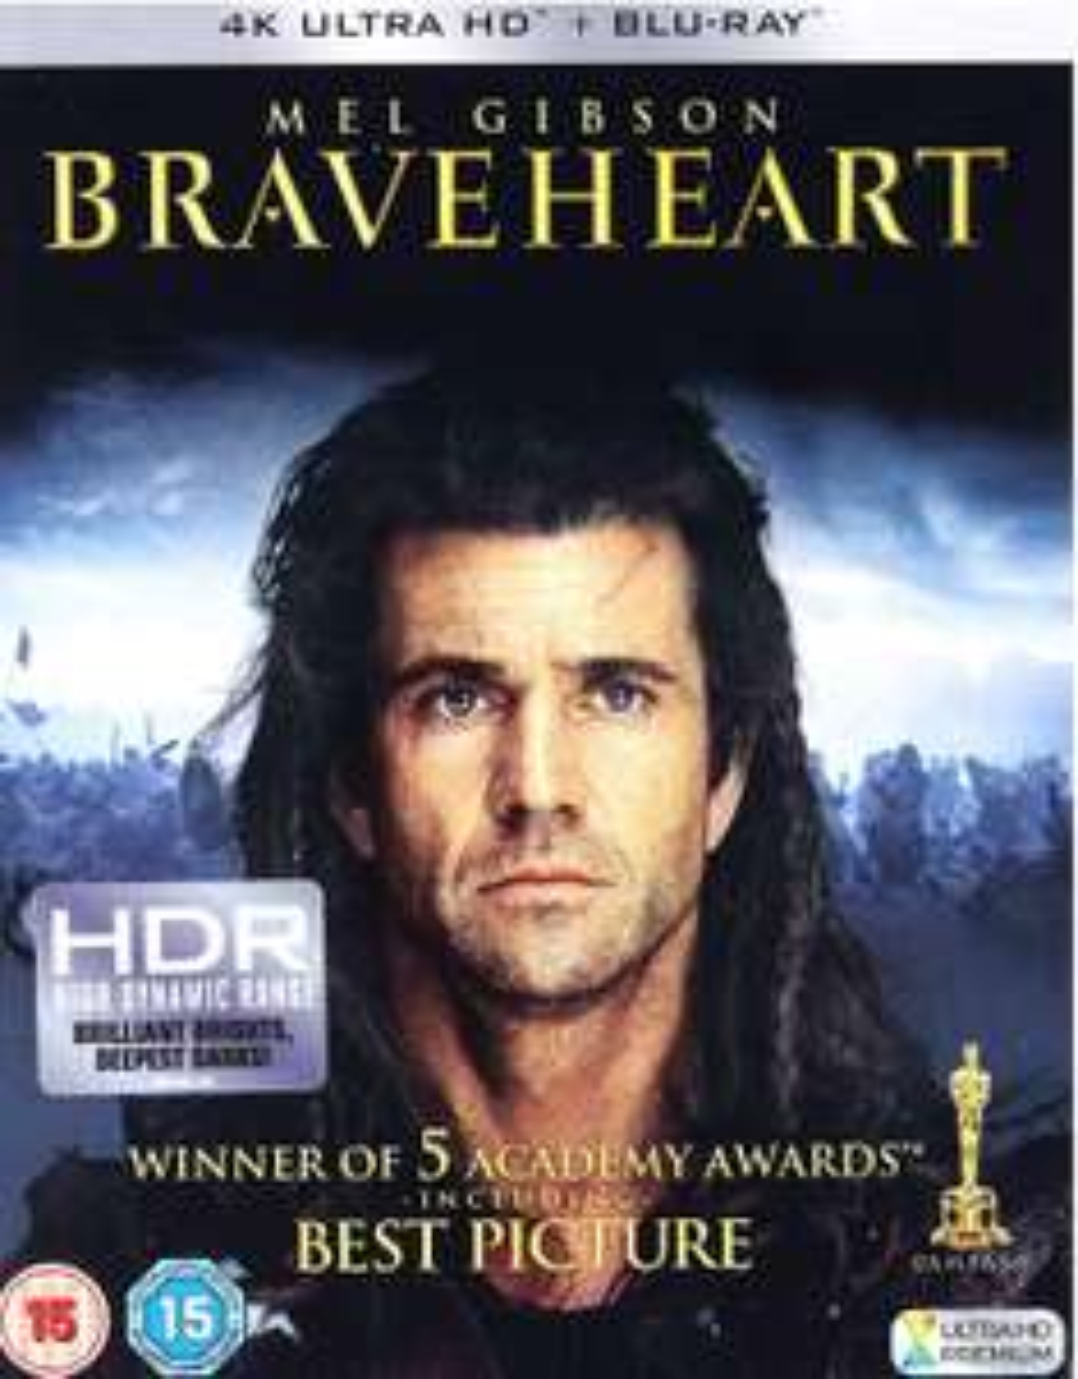 BRAVEHEART 4k/Blu ray £10.33 (Prime) / £13.32 (non Prime) at Amazon